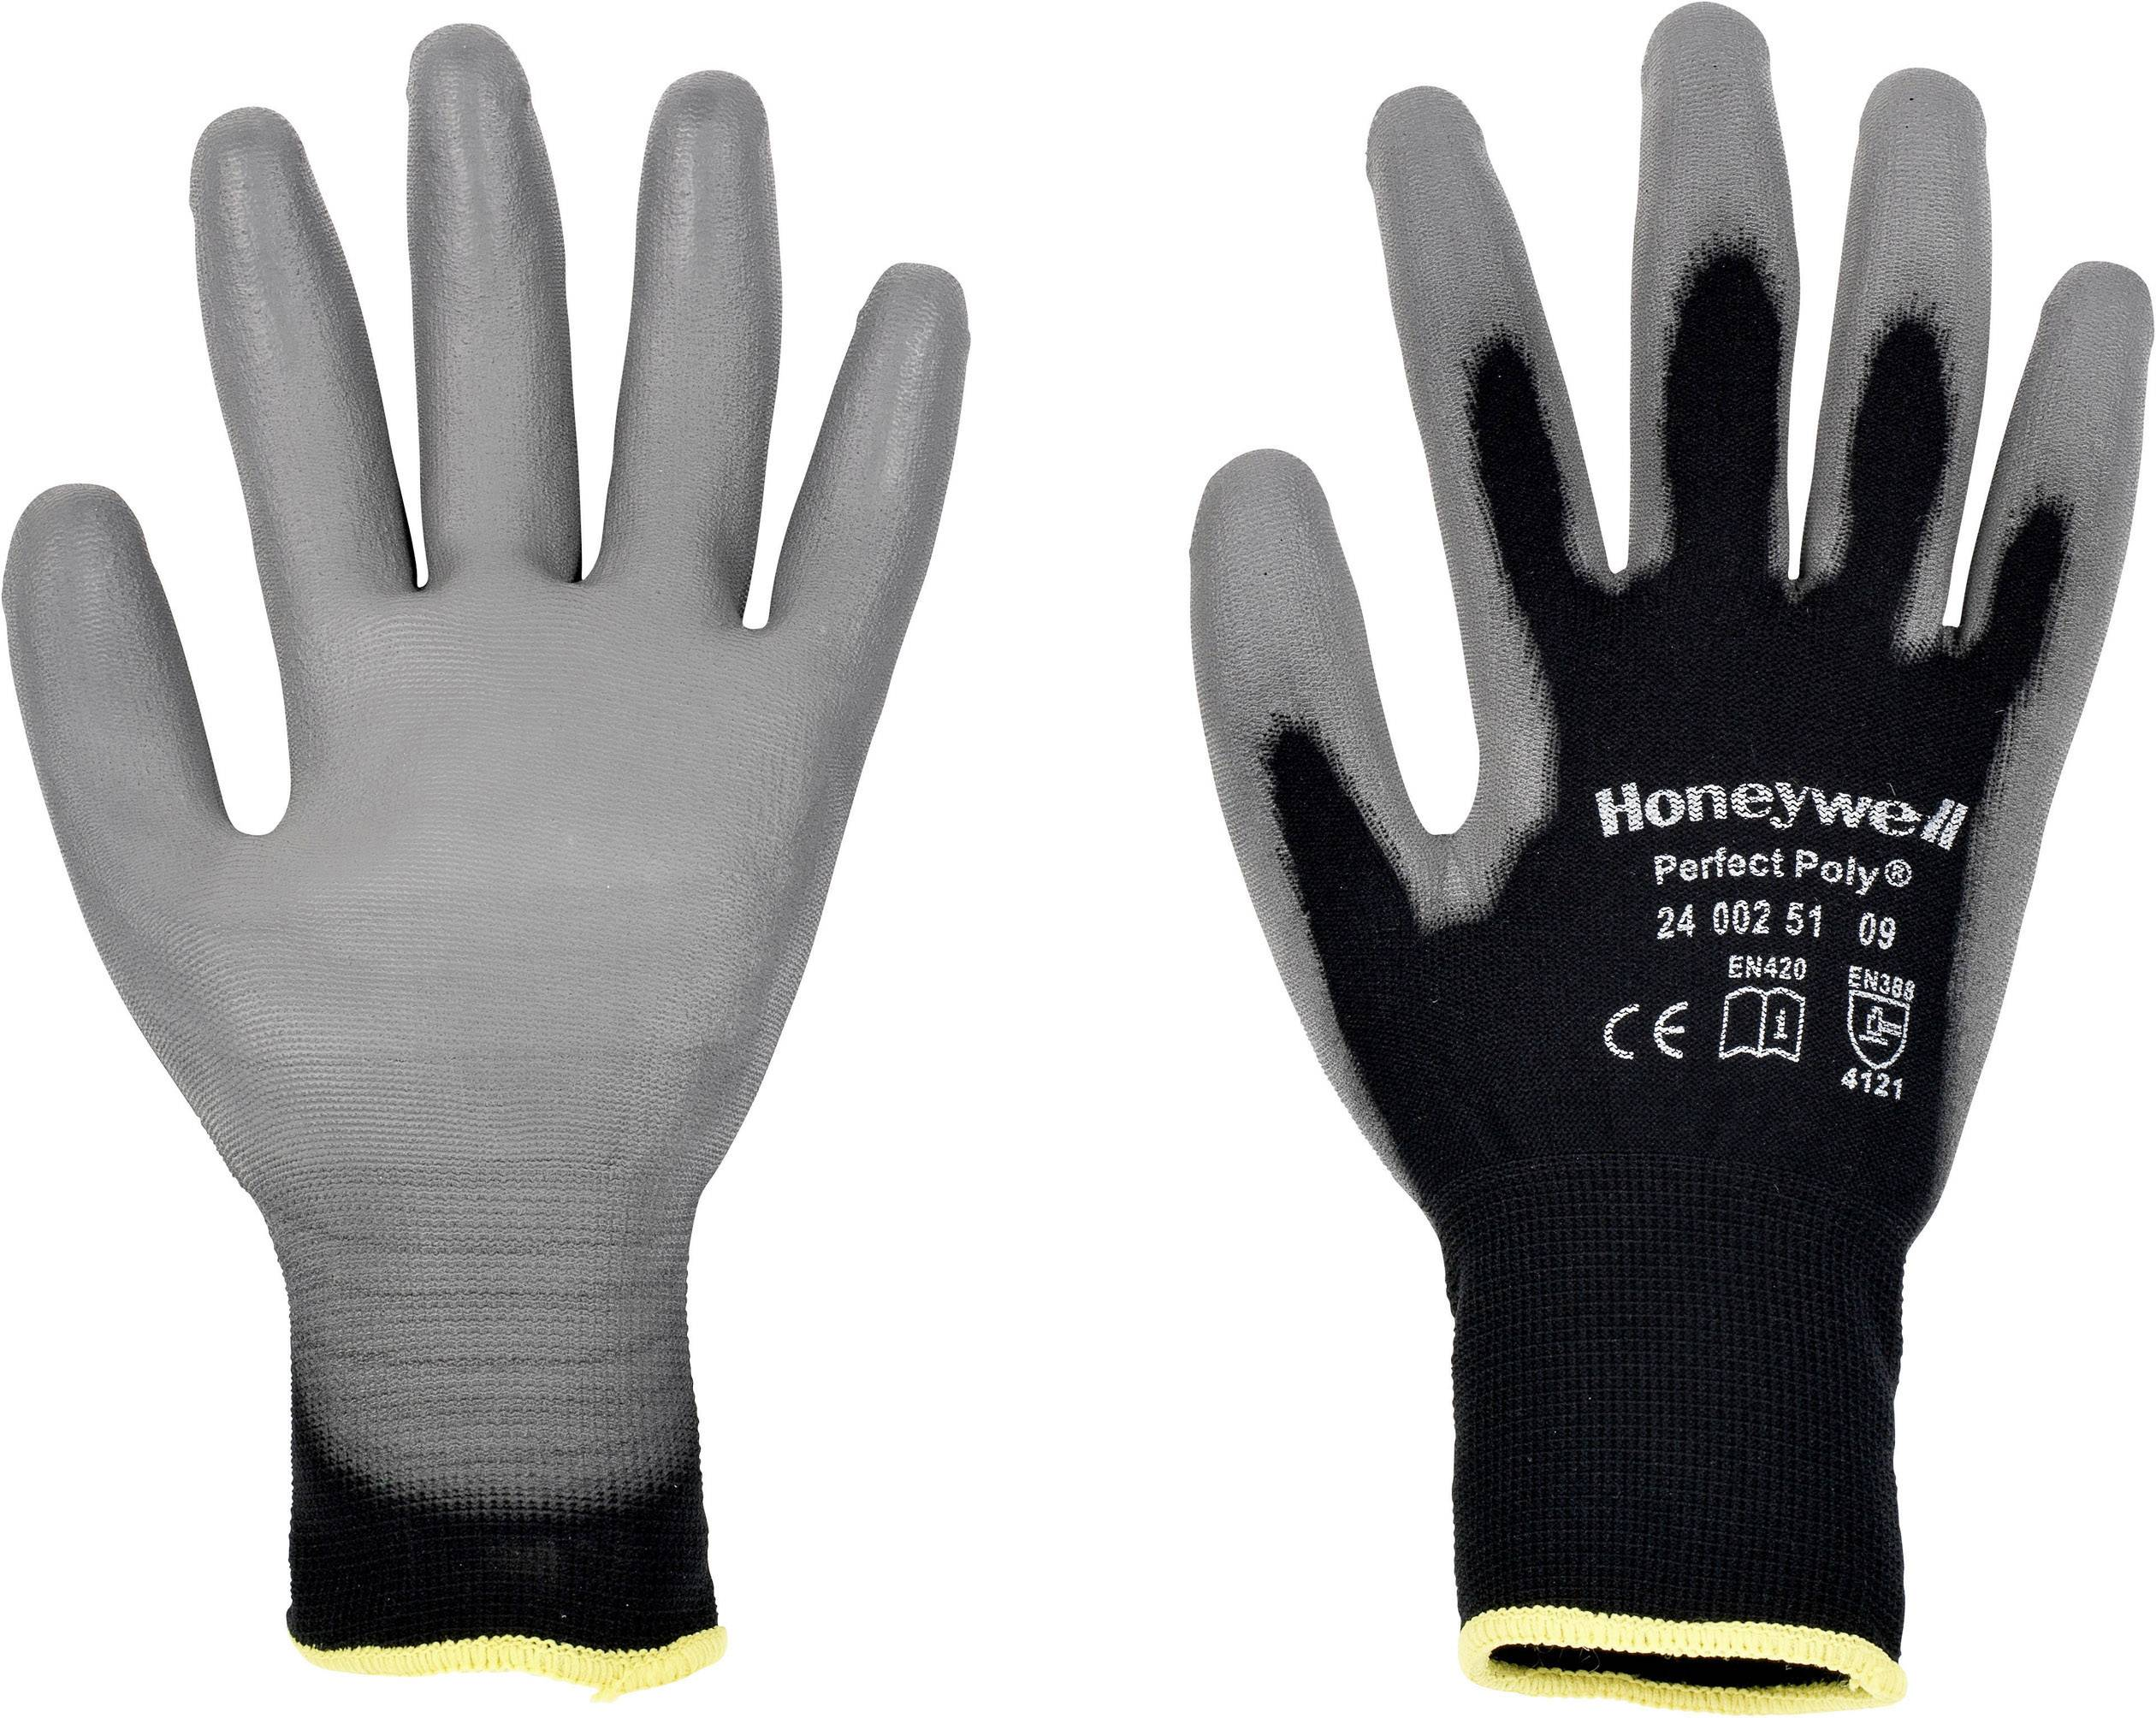 Pracovné rukavice Perfect Fit GANTS NOIRS PERFECTPOLY 2400251, velikost rukavic: 10, XL